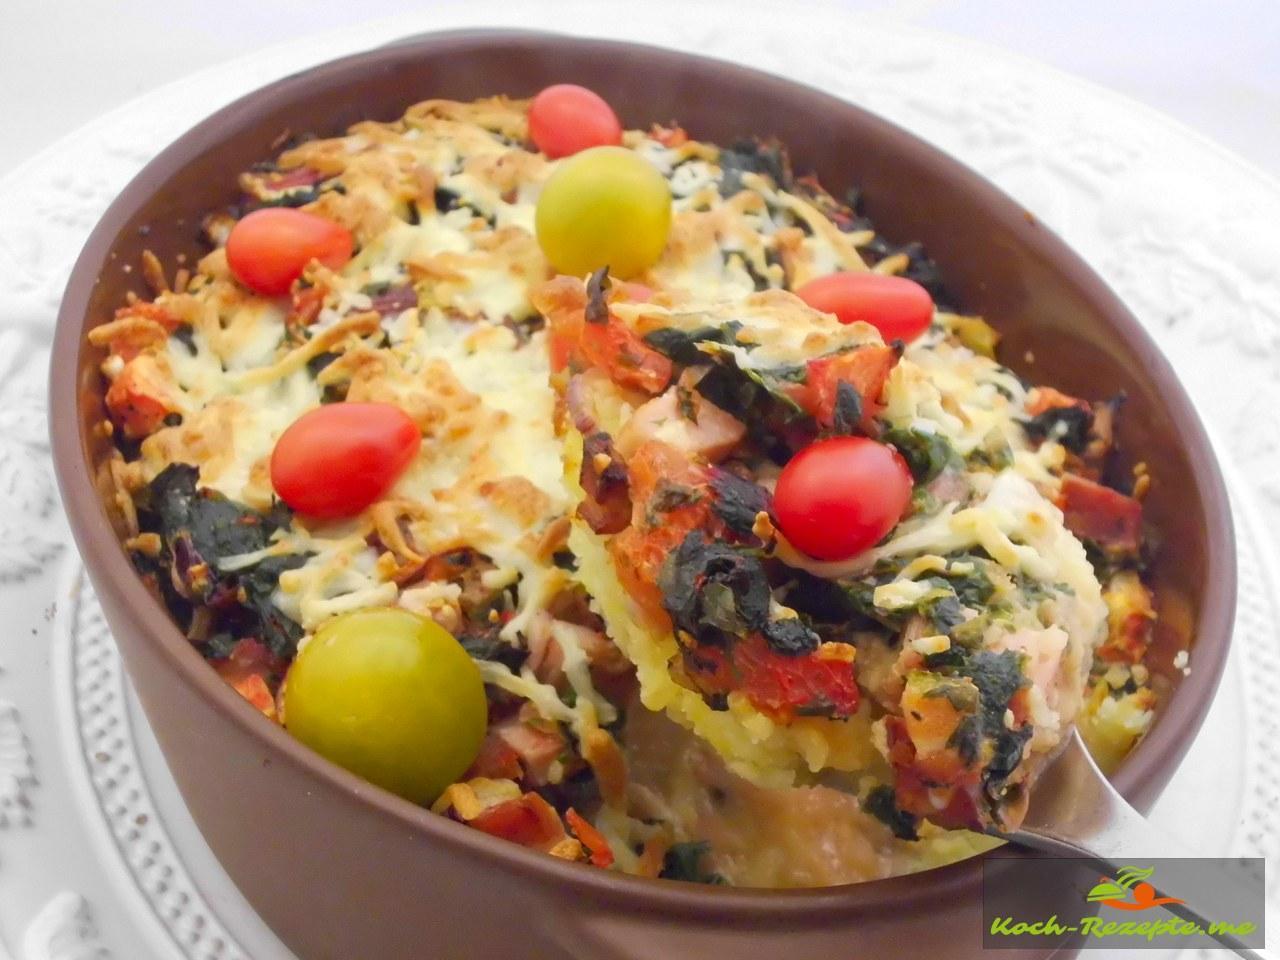 Bunter Mangold Gratin eine Gemüse-Delikatesse